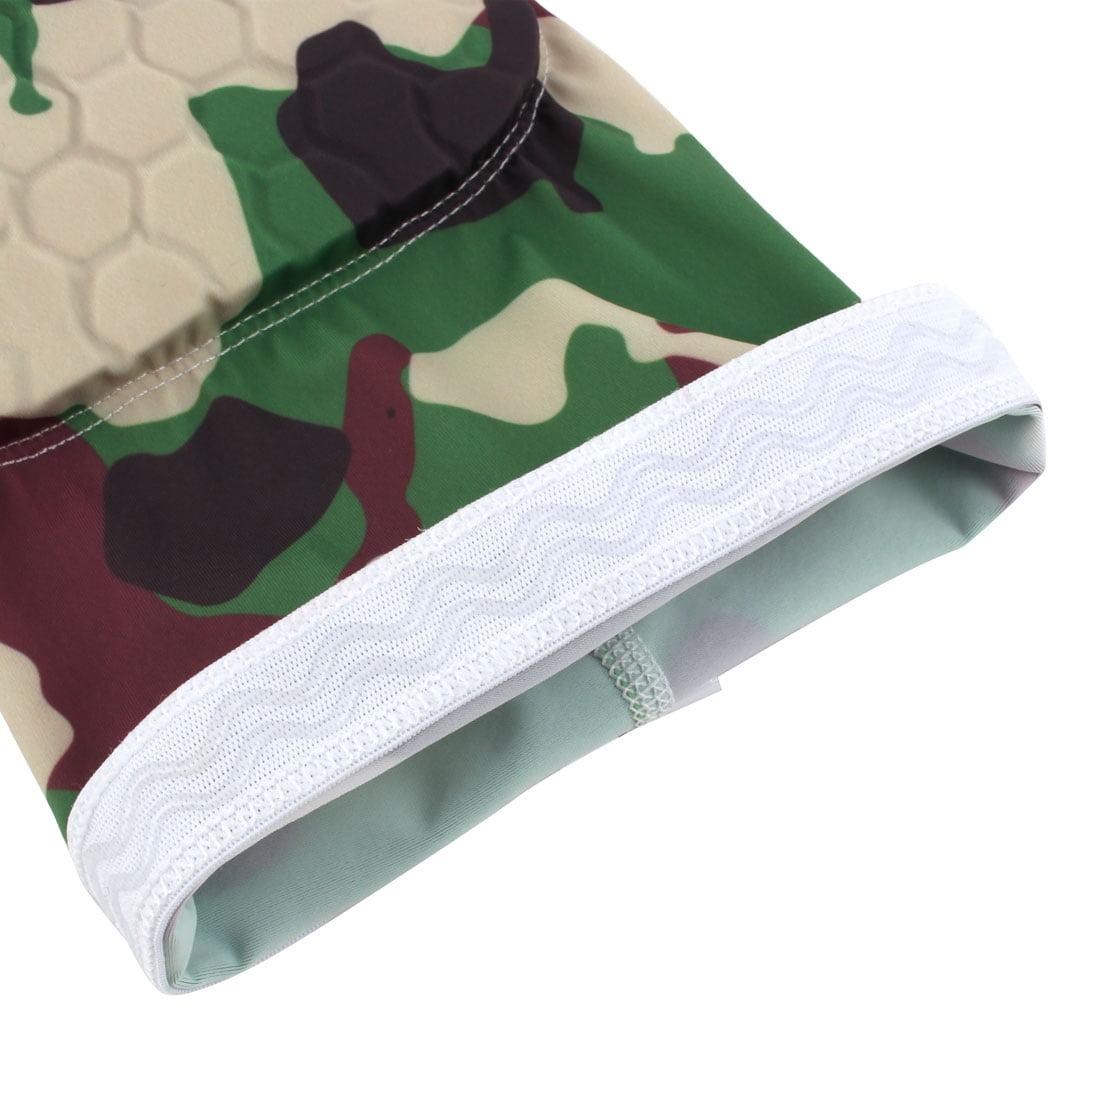 Basketball Patella Knee Brace Leg Sleeve Wrap Support Camouflage Green XL Pair - image 1 de 6